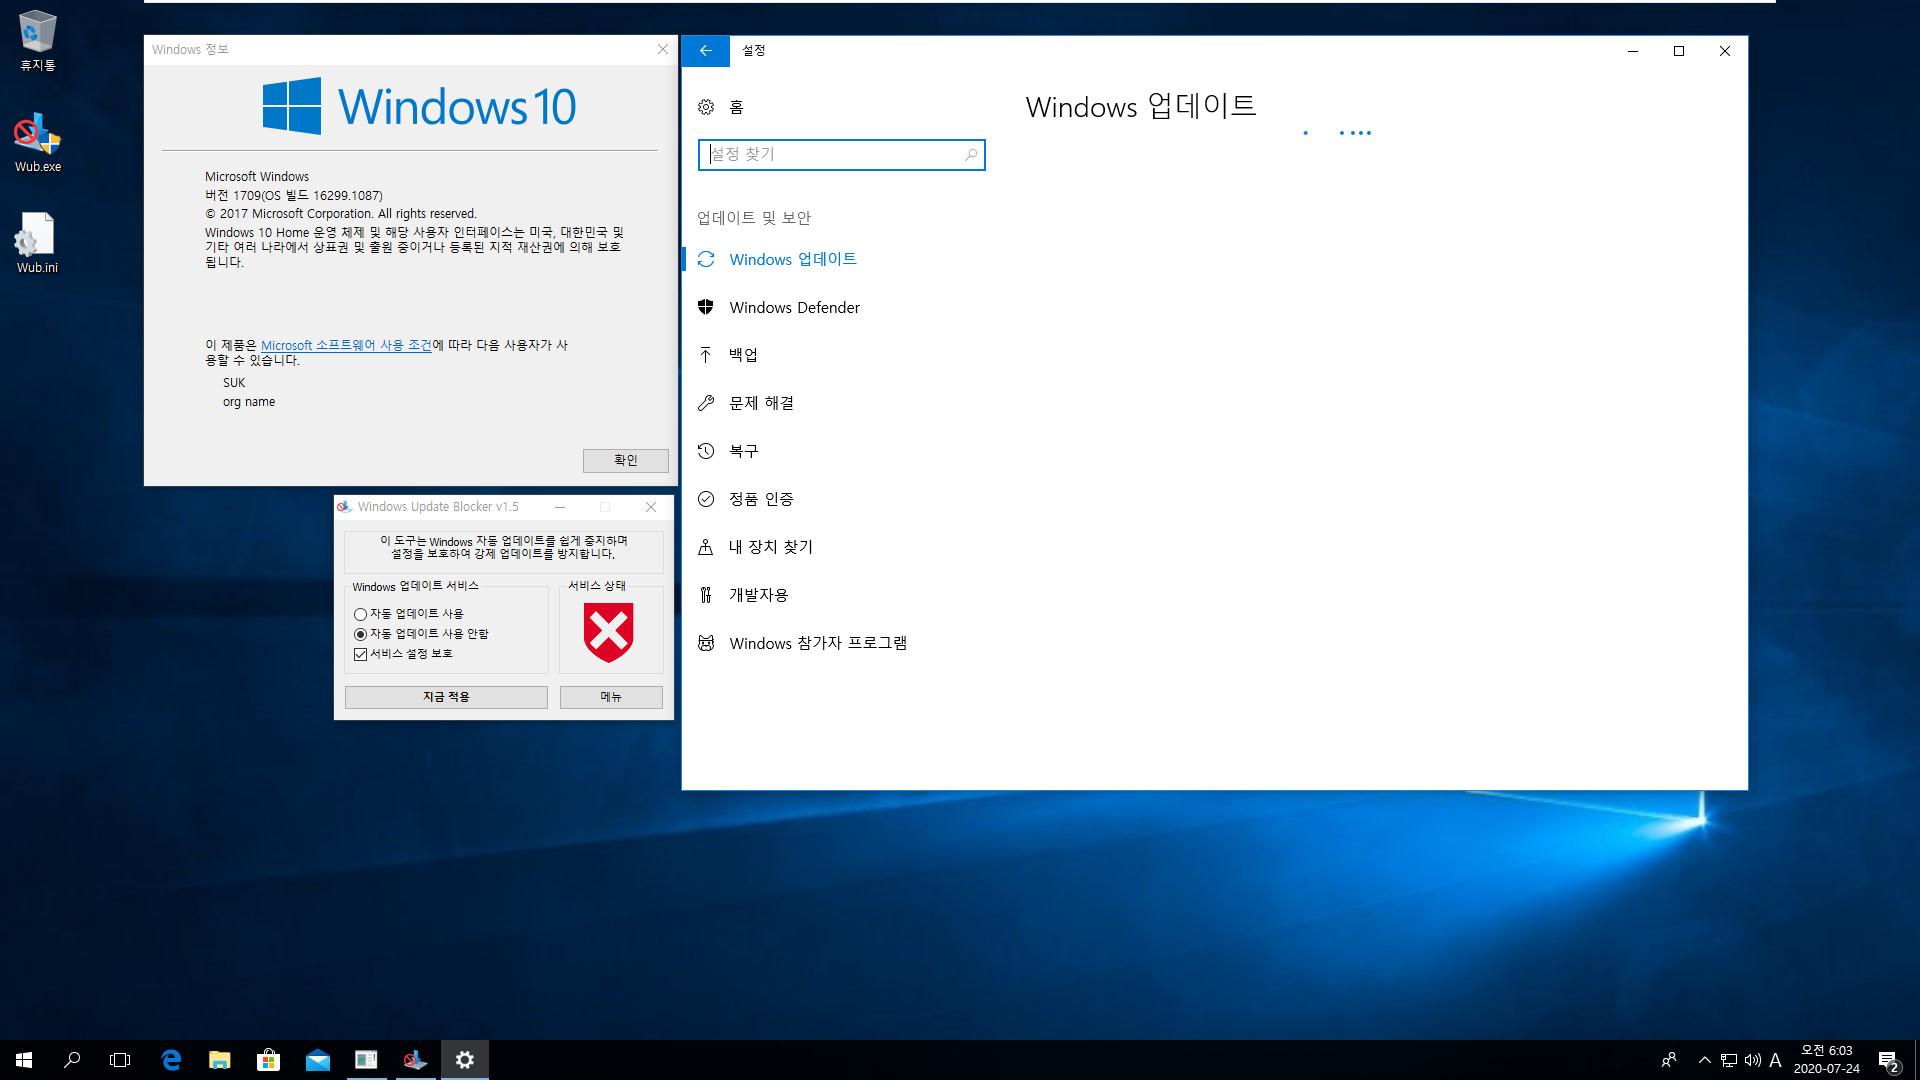 Windows Update Blocker v1.5 업데이트 방지 테스트 - 윈도우는 버전 1709으로 현재 강제 업데이트 중인 버전이고 홈 에디션-설정을 닫고 다시 열면 이렇게 무한 구슬 지나갑니다 2020-07-24_060335.jpg